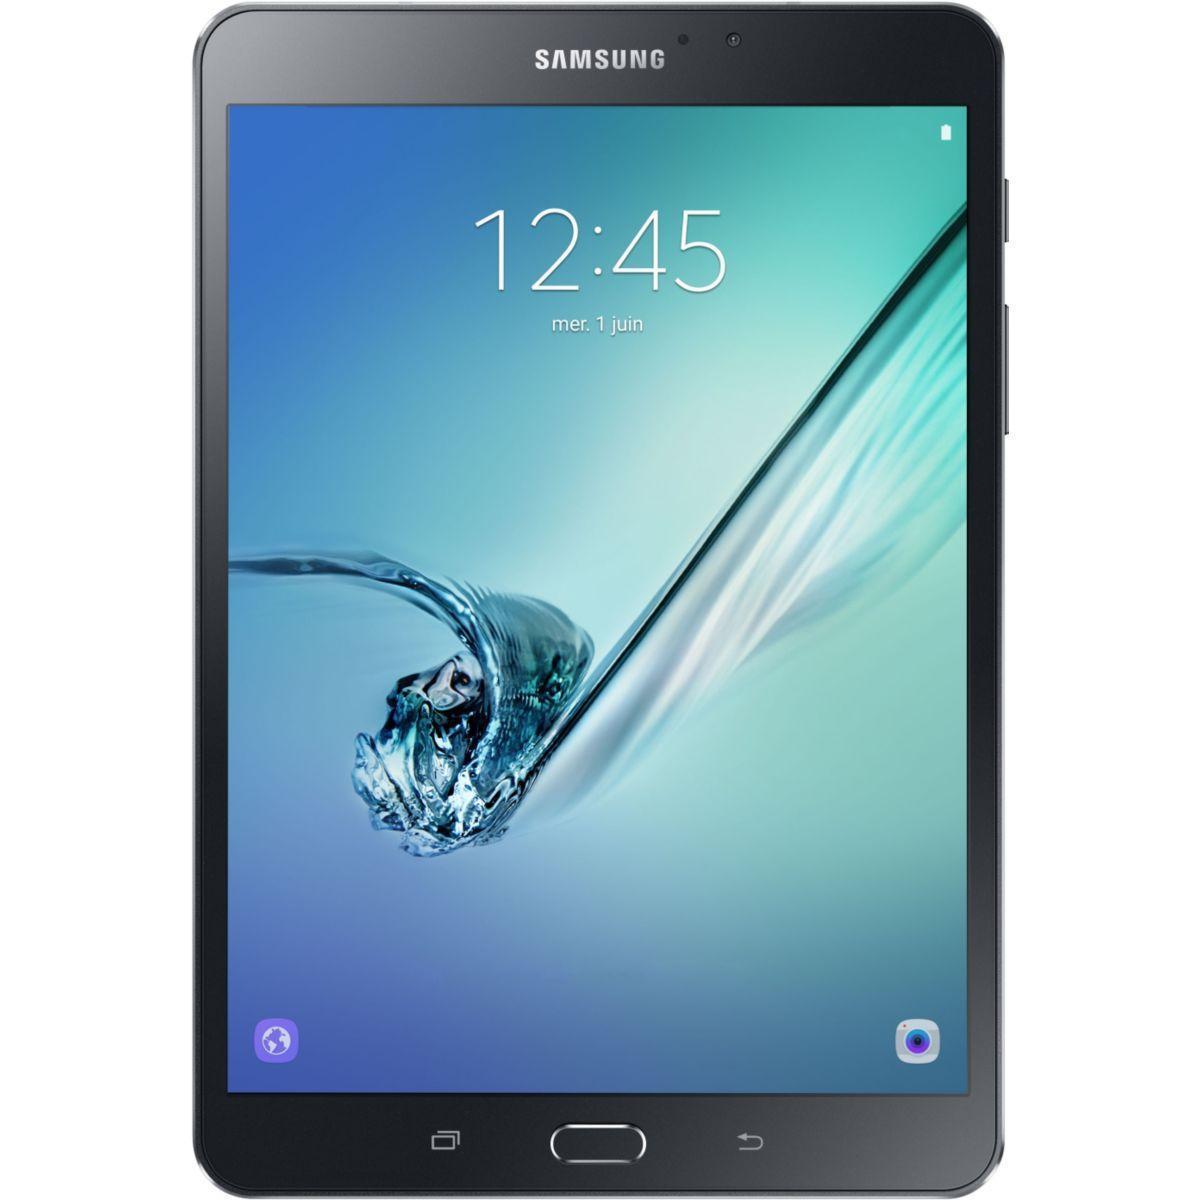 Galaxy Tab S2 8.0 (2015) - WiFi